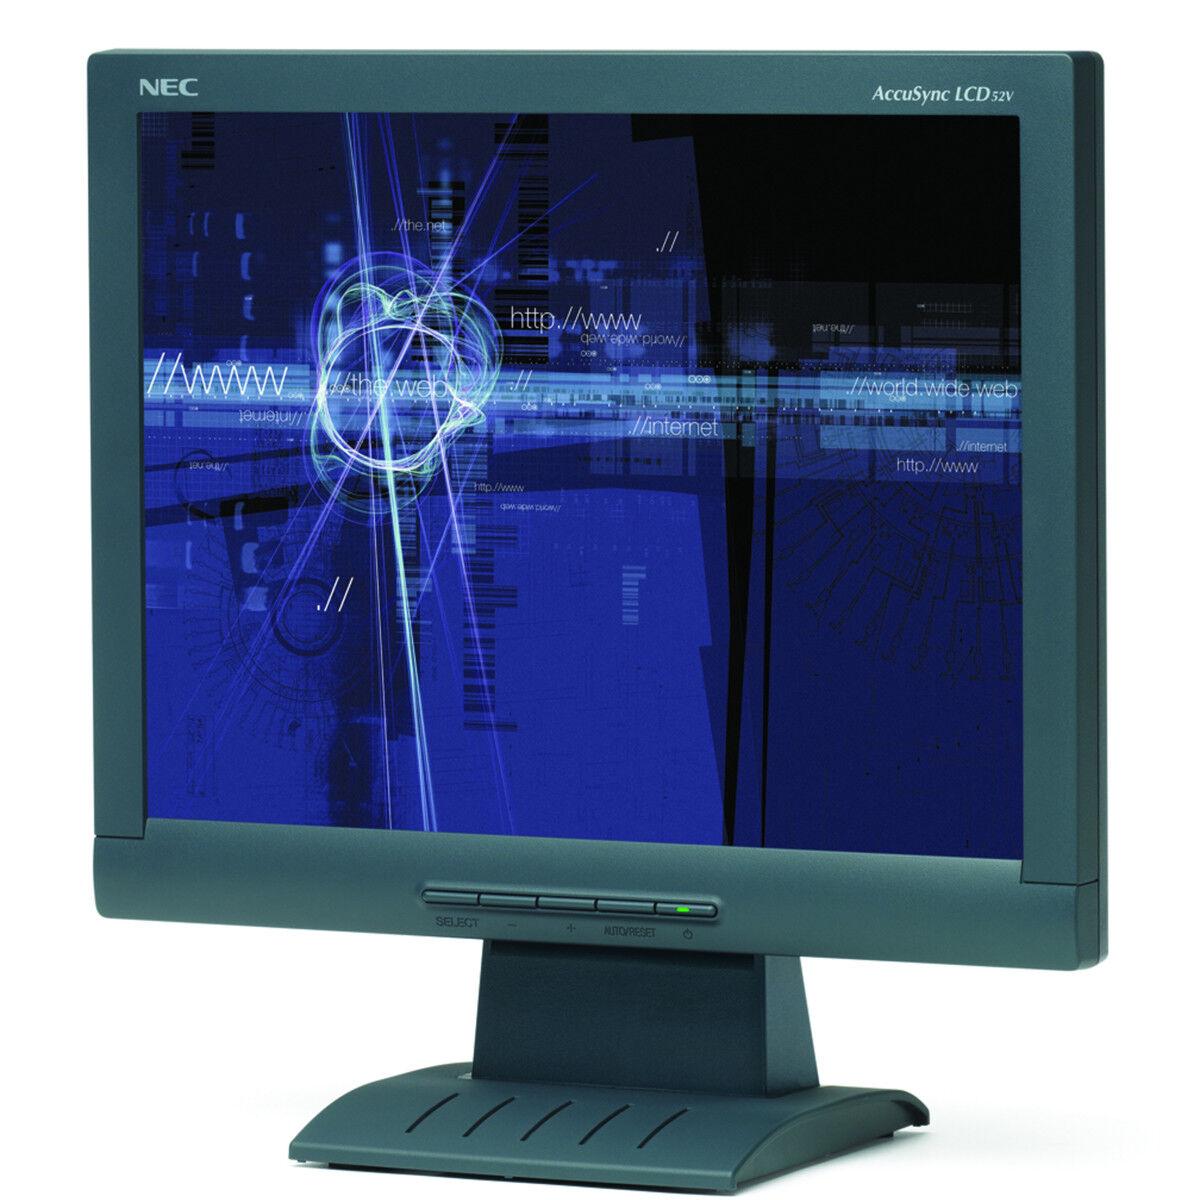 "NEC ACCUSYNC LCD52V 15"" LCD MONITOR - 90 DAYS WARRANTY ASLCD"